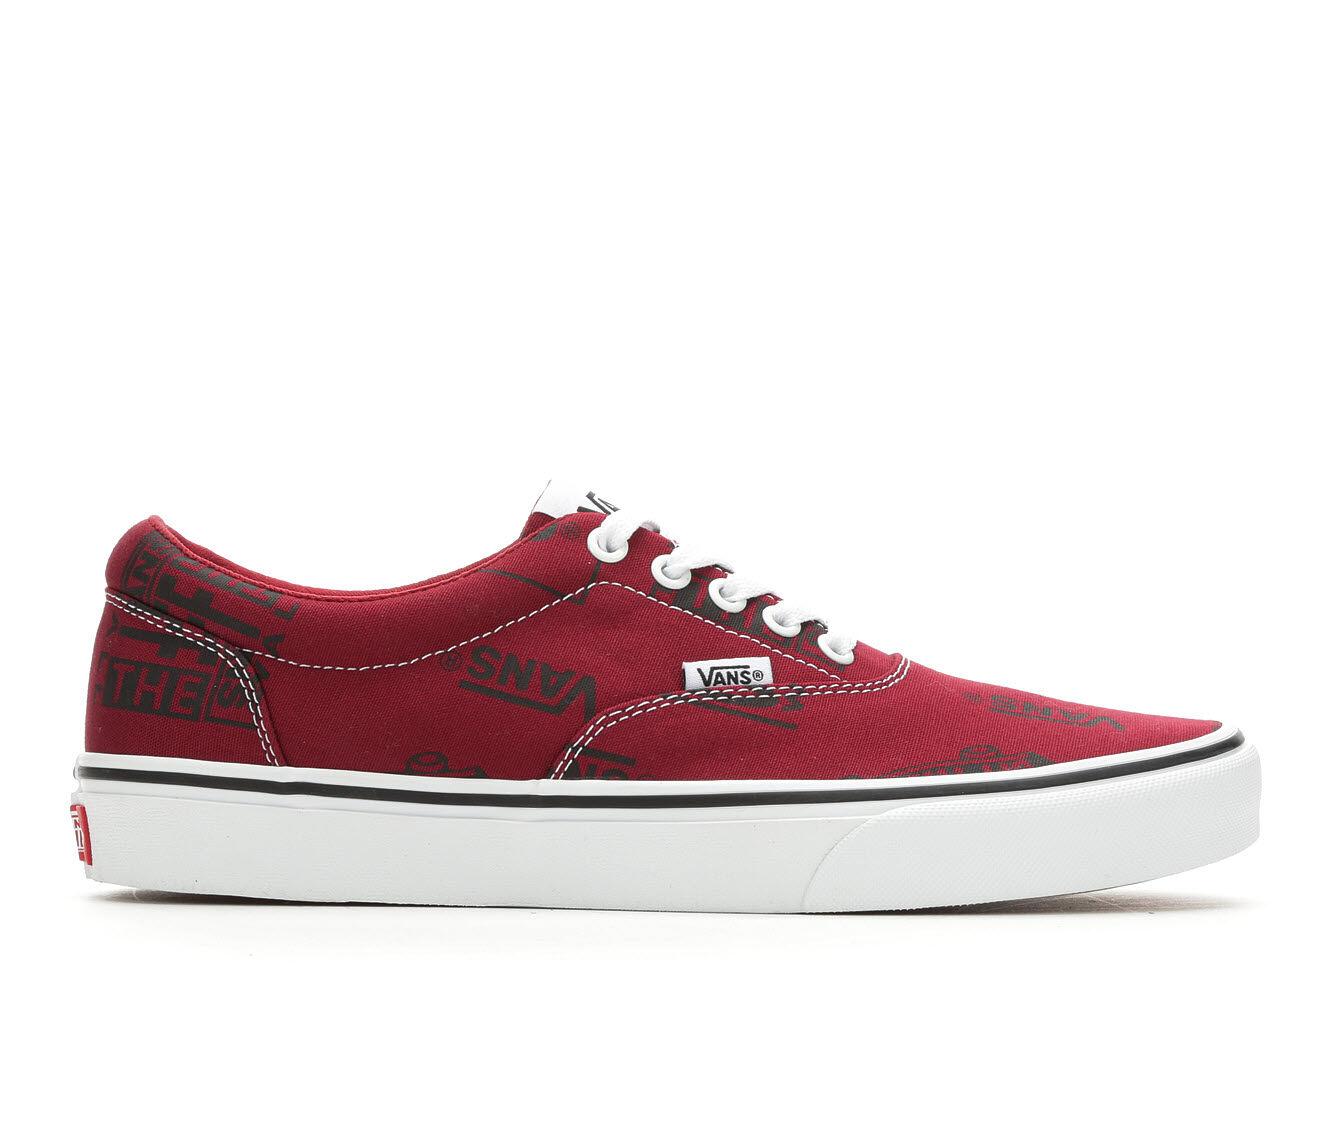 Men's Vans Doheny Skate Shoes Burg/Bk/Wh Logo